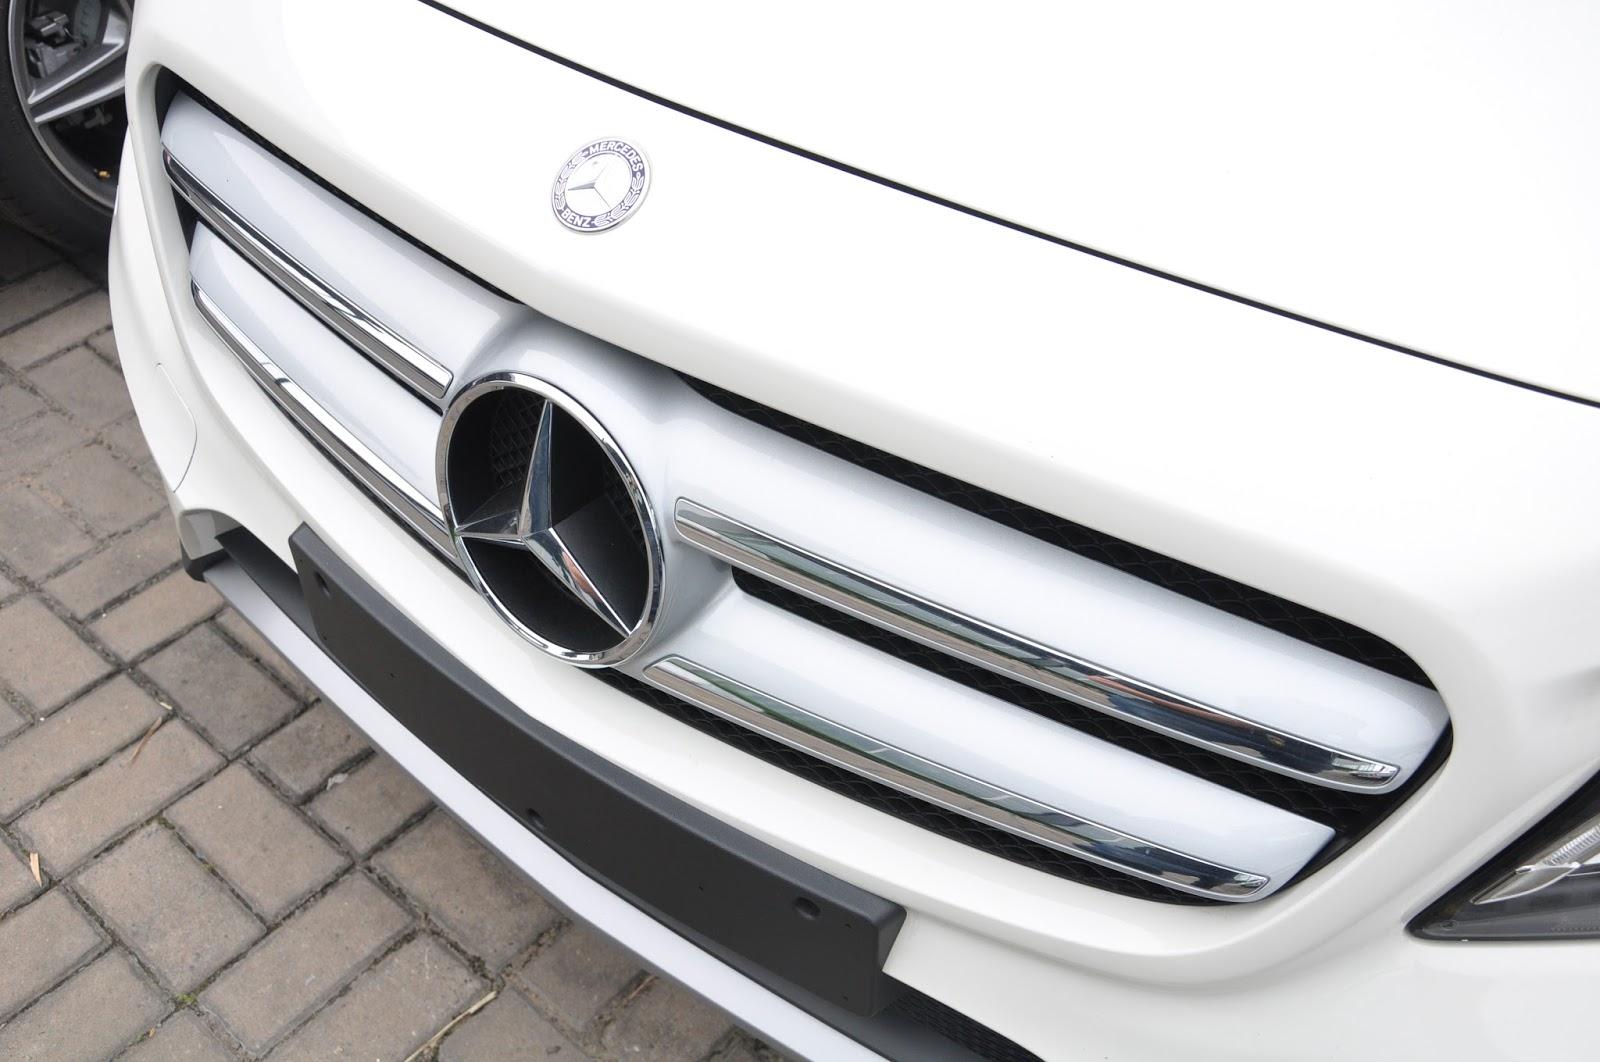 Xe Mercedes Benz GLA 250 4Matic màu trắng 02